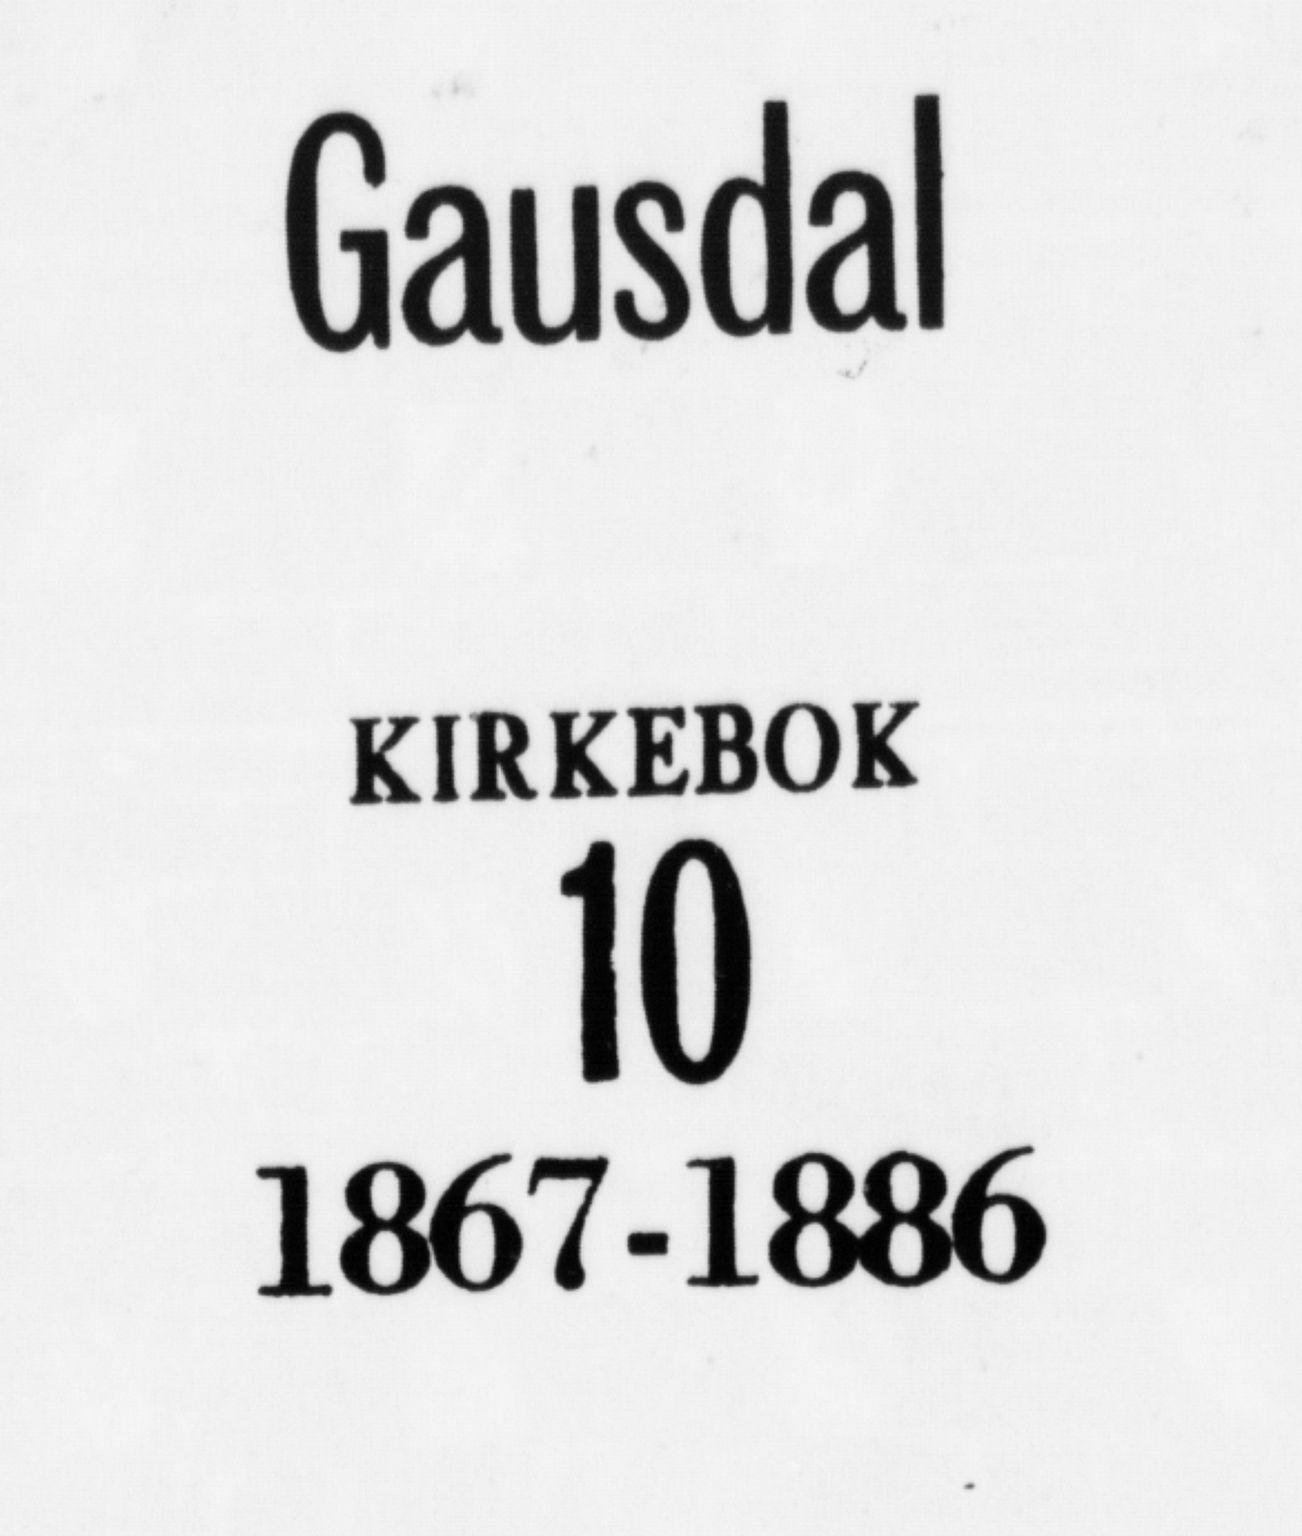 SAH, Gausdal prestekontor, Ministerialbok nr. 10, 1867-1886